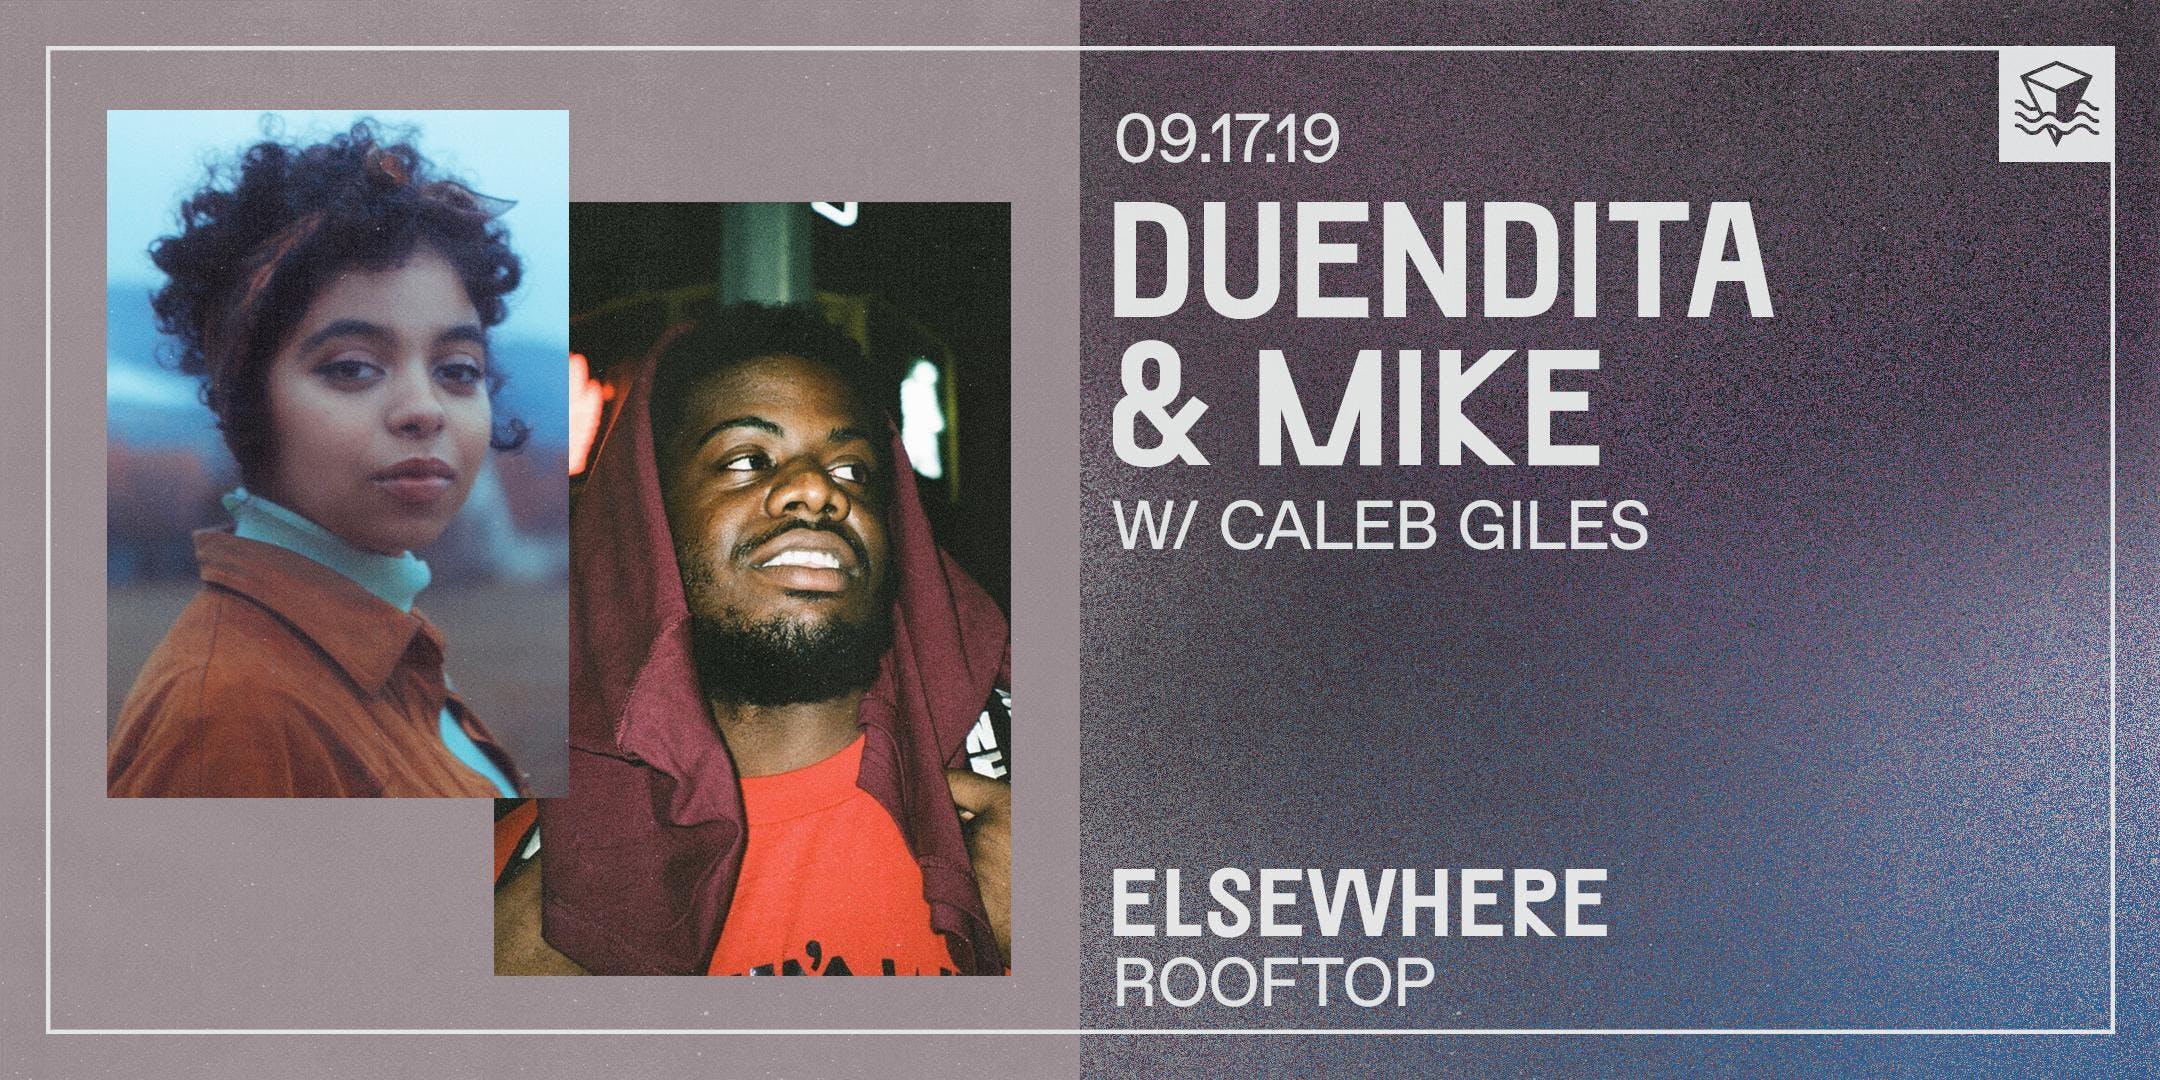 duendita & MIKE w/ Caleb Giles